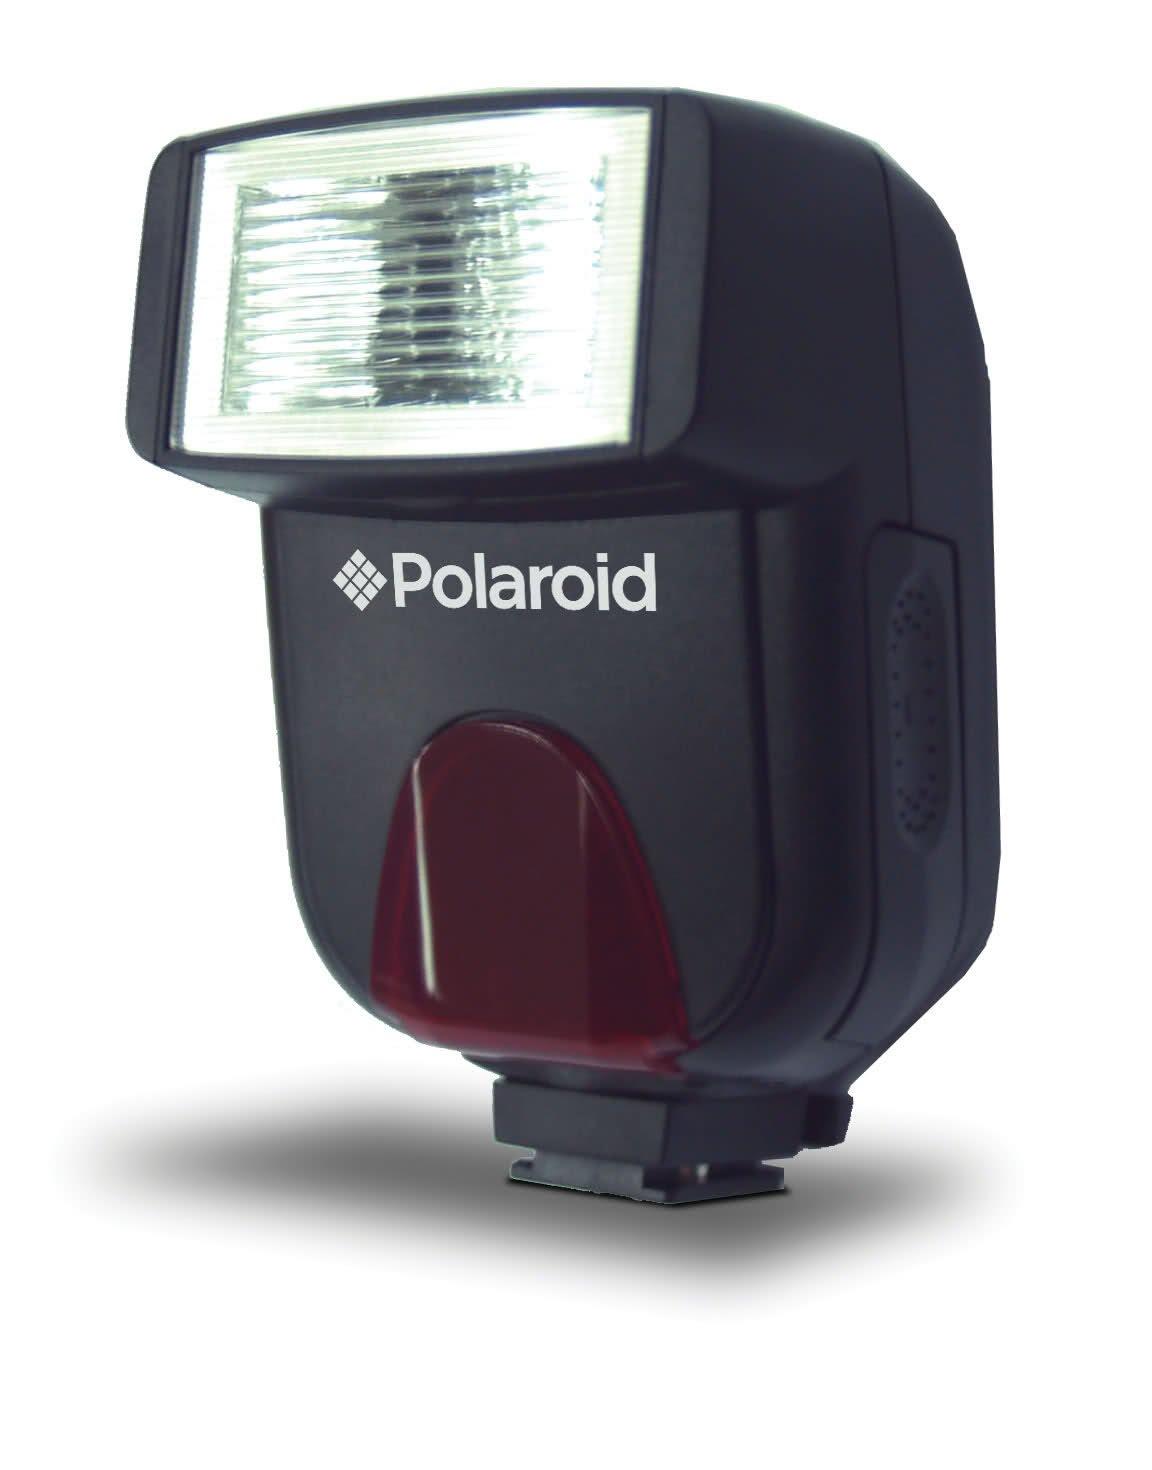 Polaroid PL-108AF Studio Series Digital Auto Focus / TTL Shoe Mount Flash For The Sony Alpha NEX-6, 7, 7s, SLT-A33, A35, A37, A55, A57, A58, A65, A77, A77 II, A99, HX400V, A6000, A100, A200, A230, A290, A300, A330, A350, A380, A390, A450, A500, A560, A550,